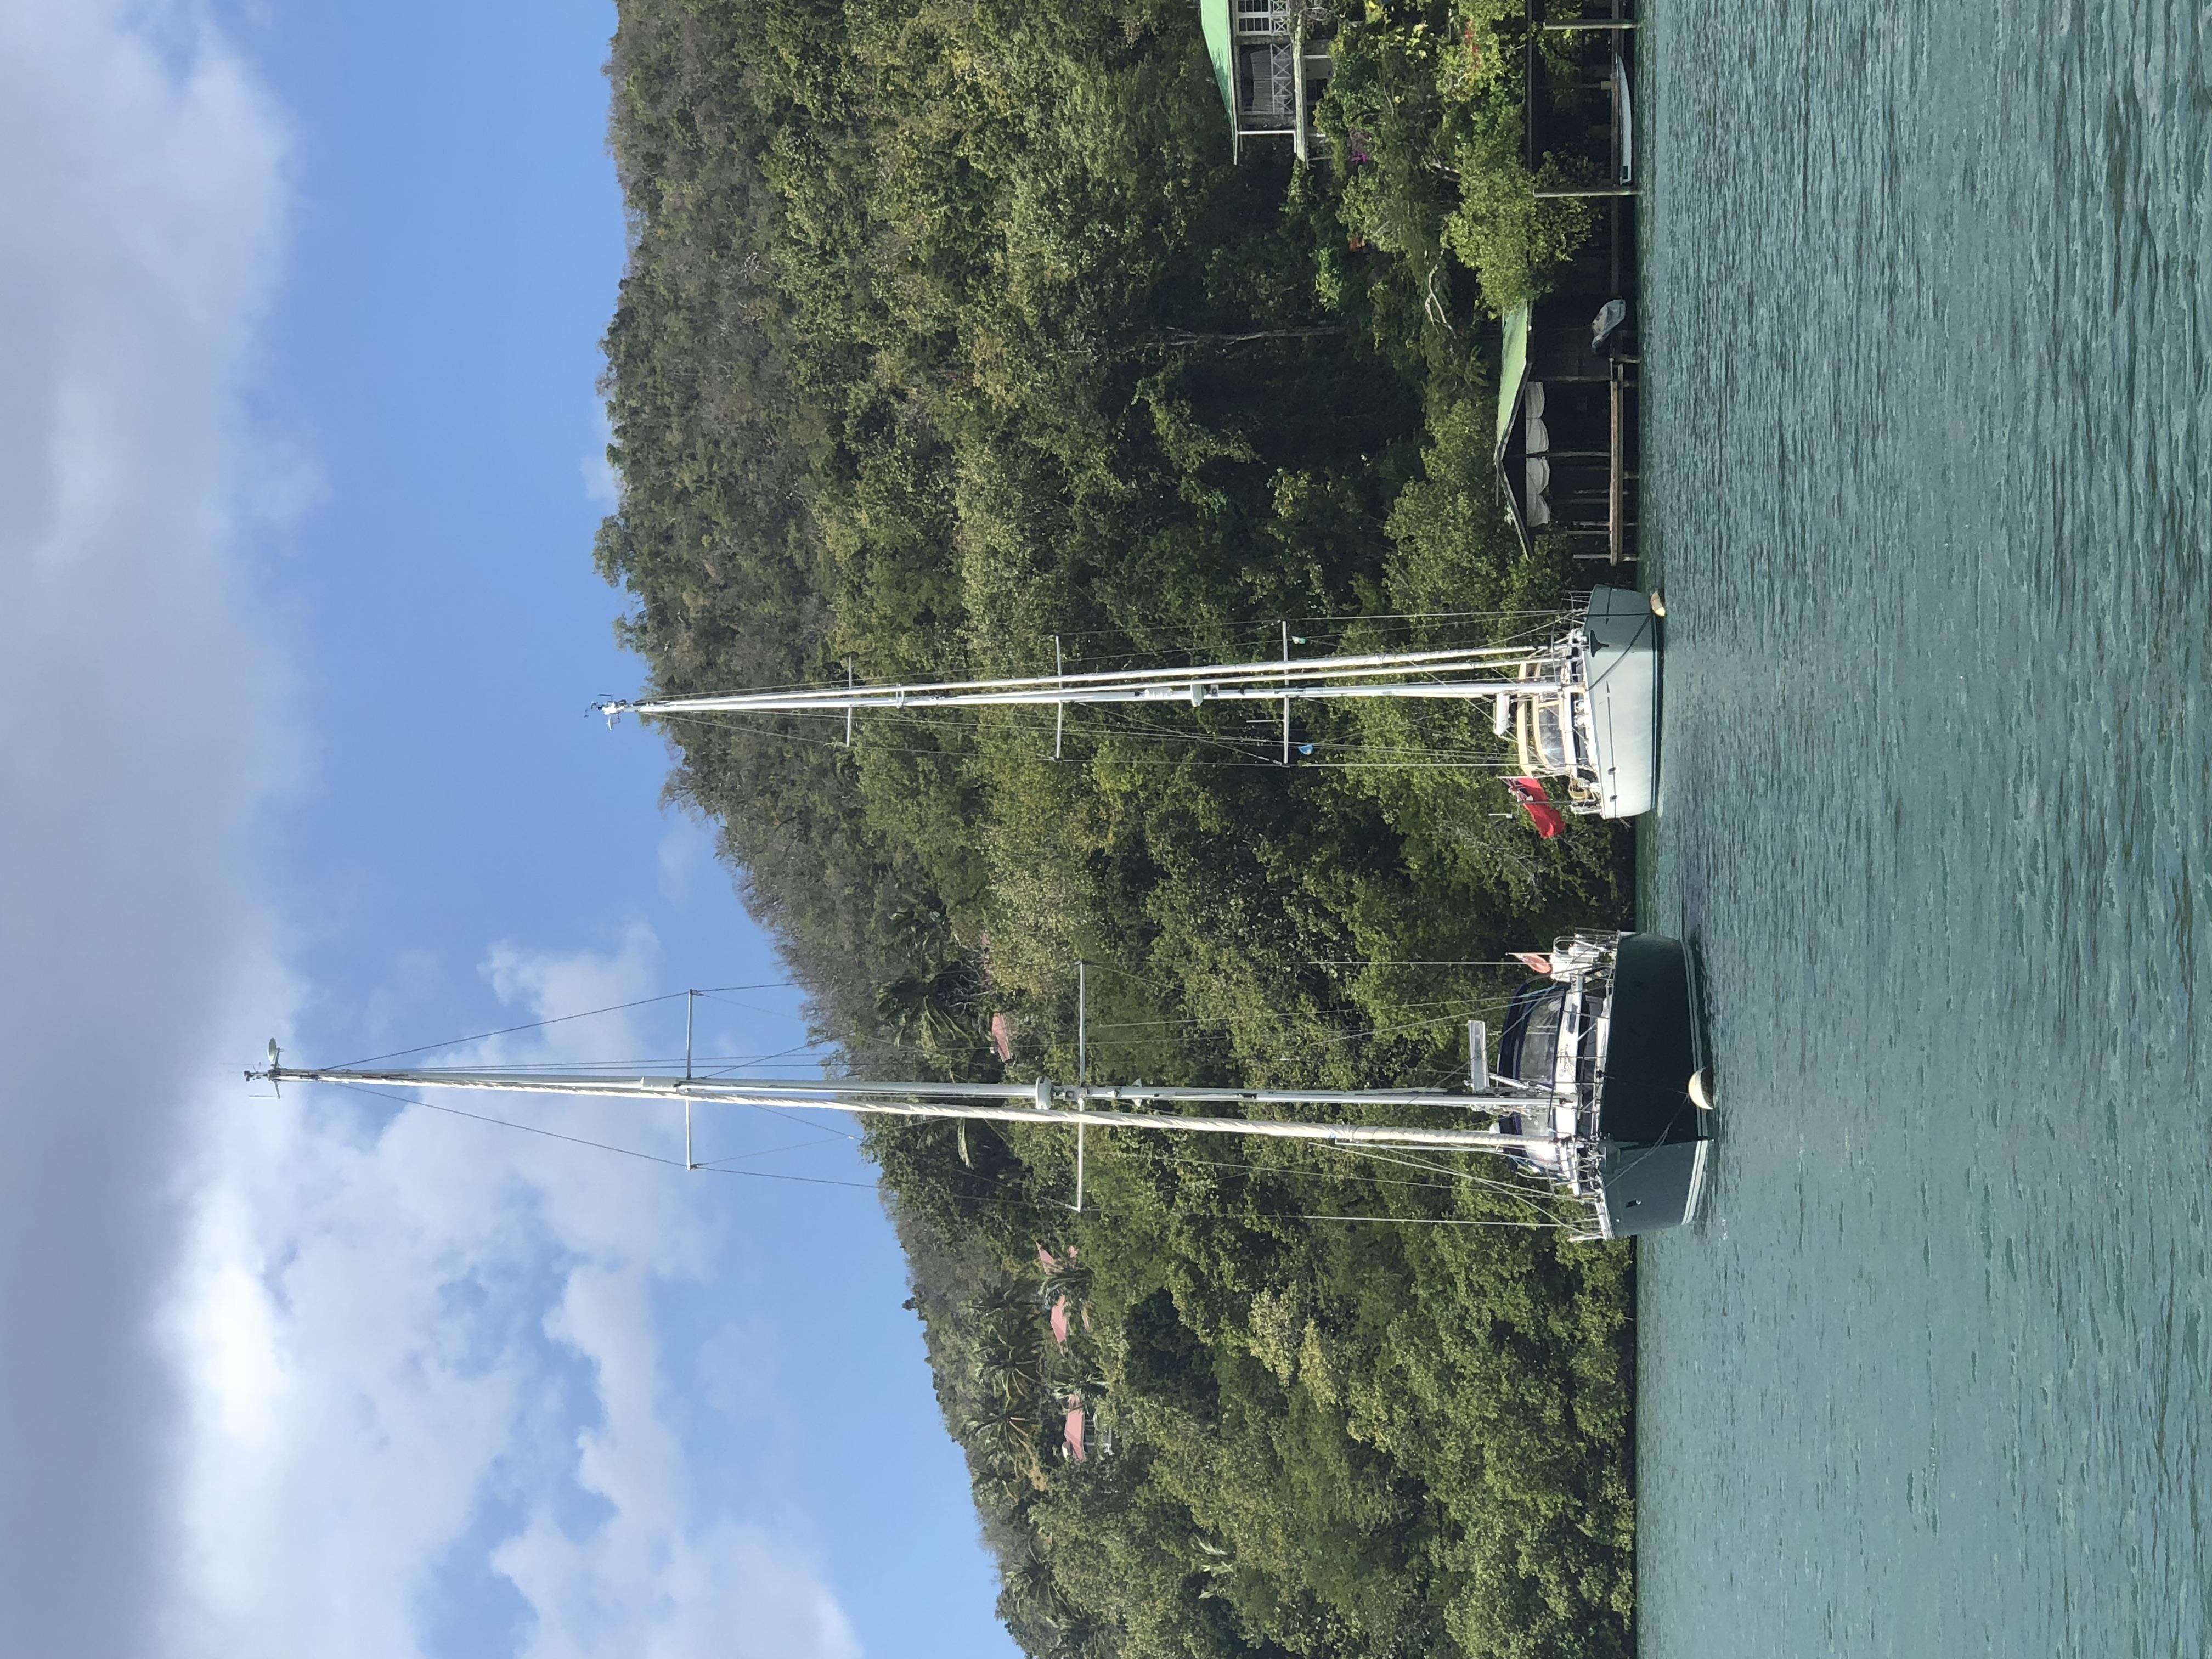 A Disco and Moana in Marigot Bay